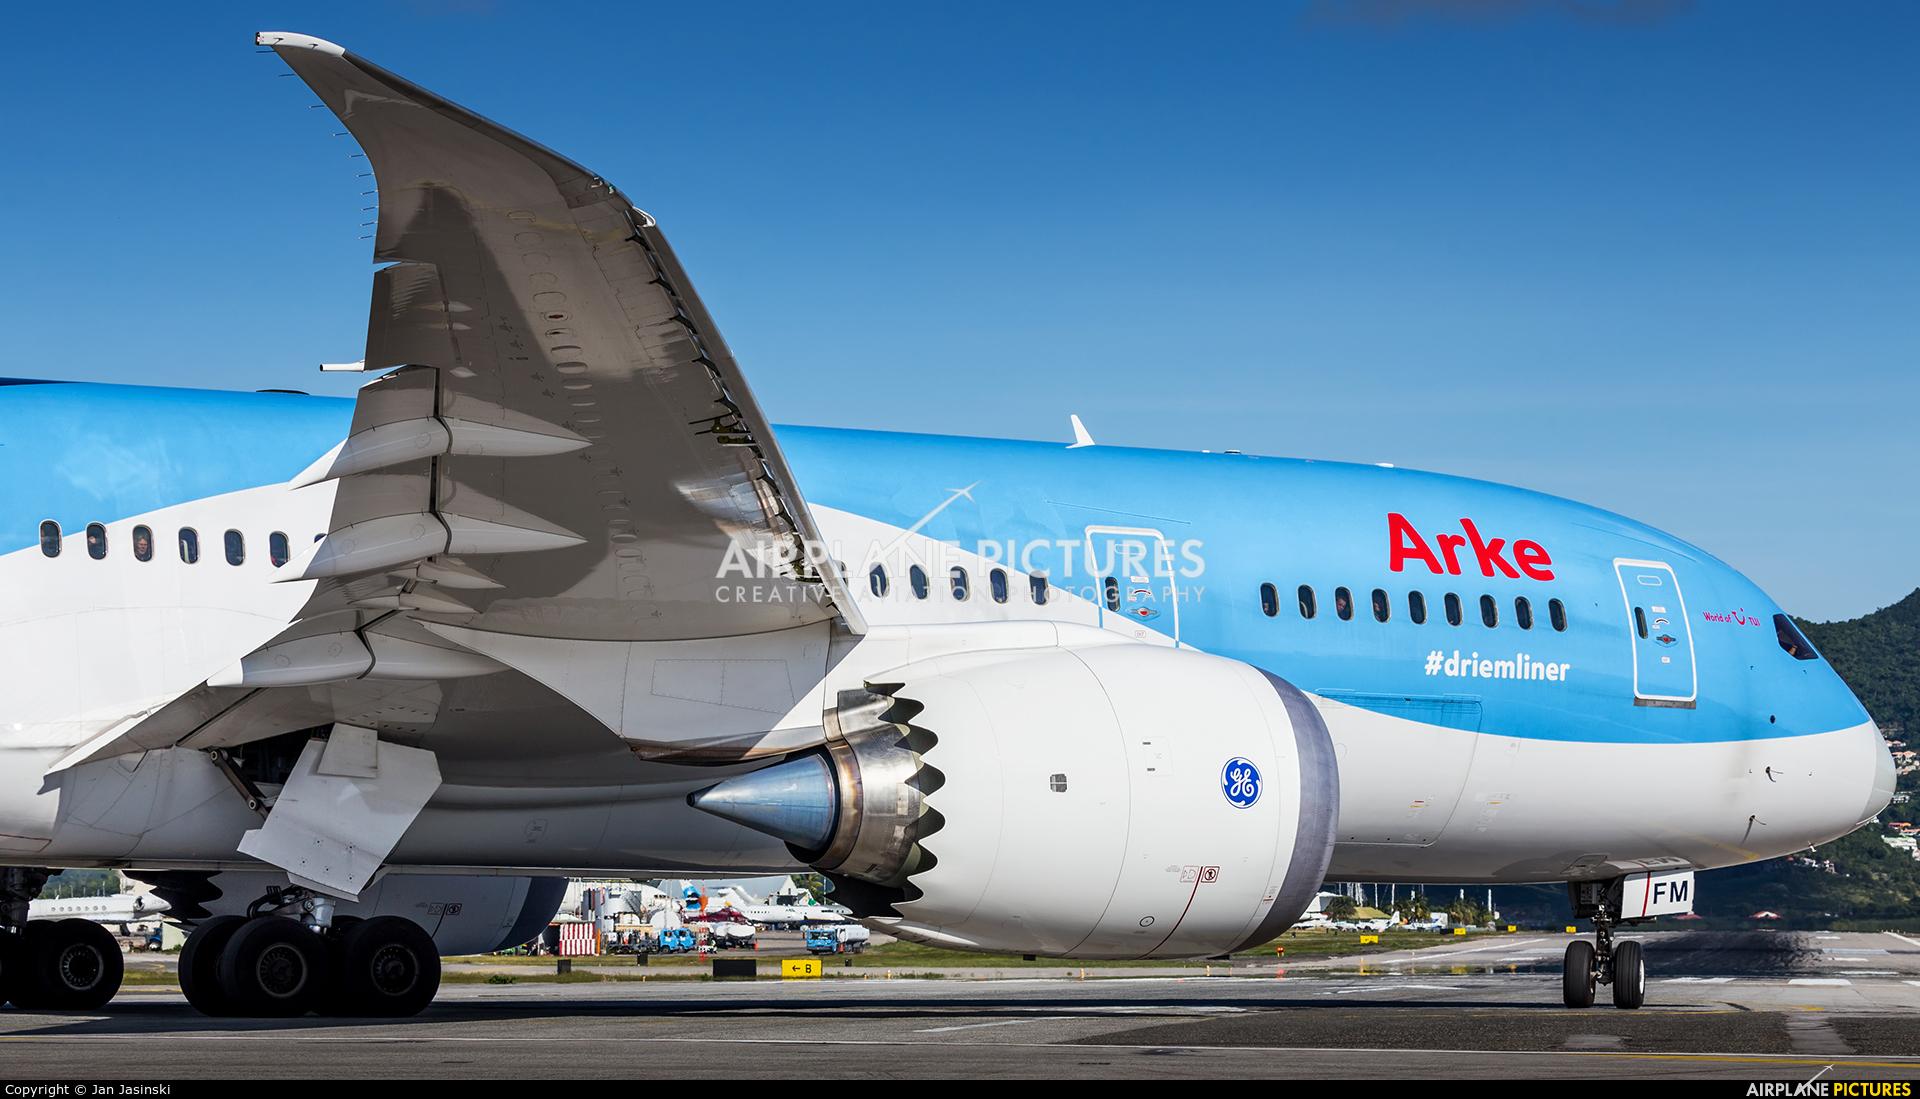 Arke/Arkefly PH-TFM aircraft at Sint Maarten - Princess Juliana Intl